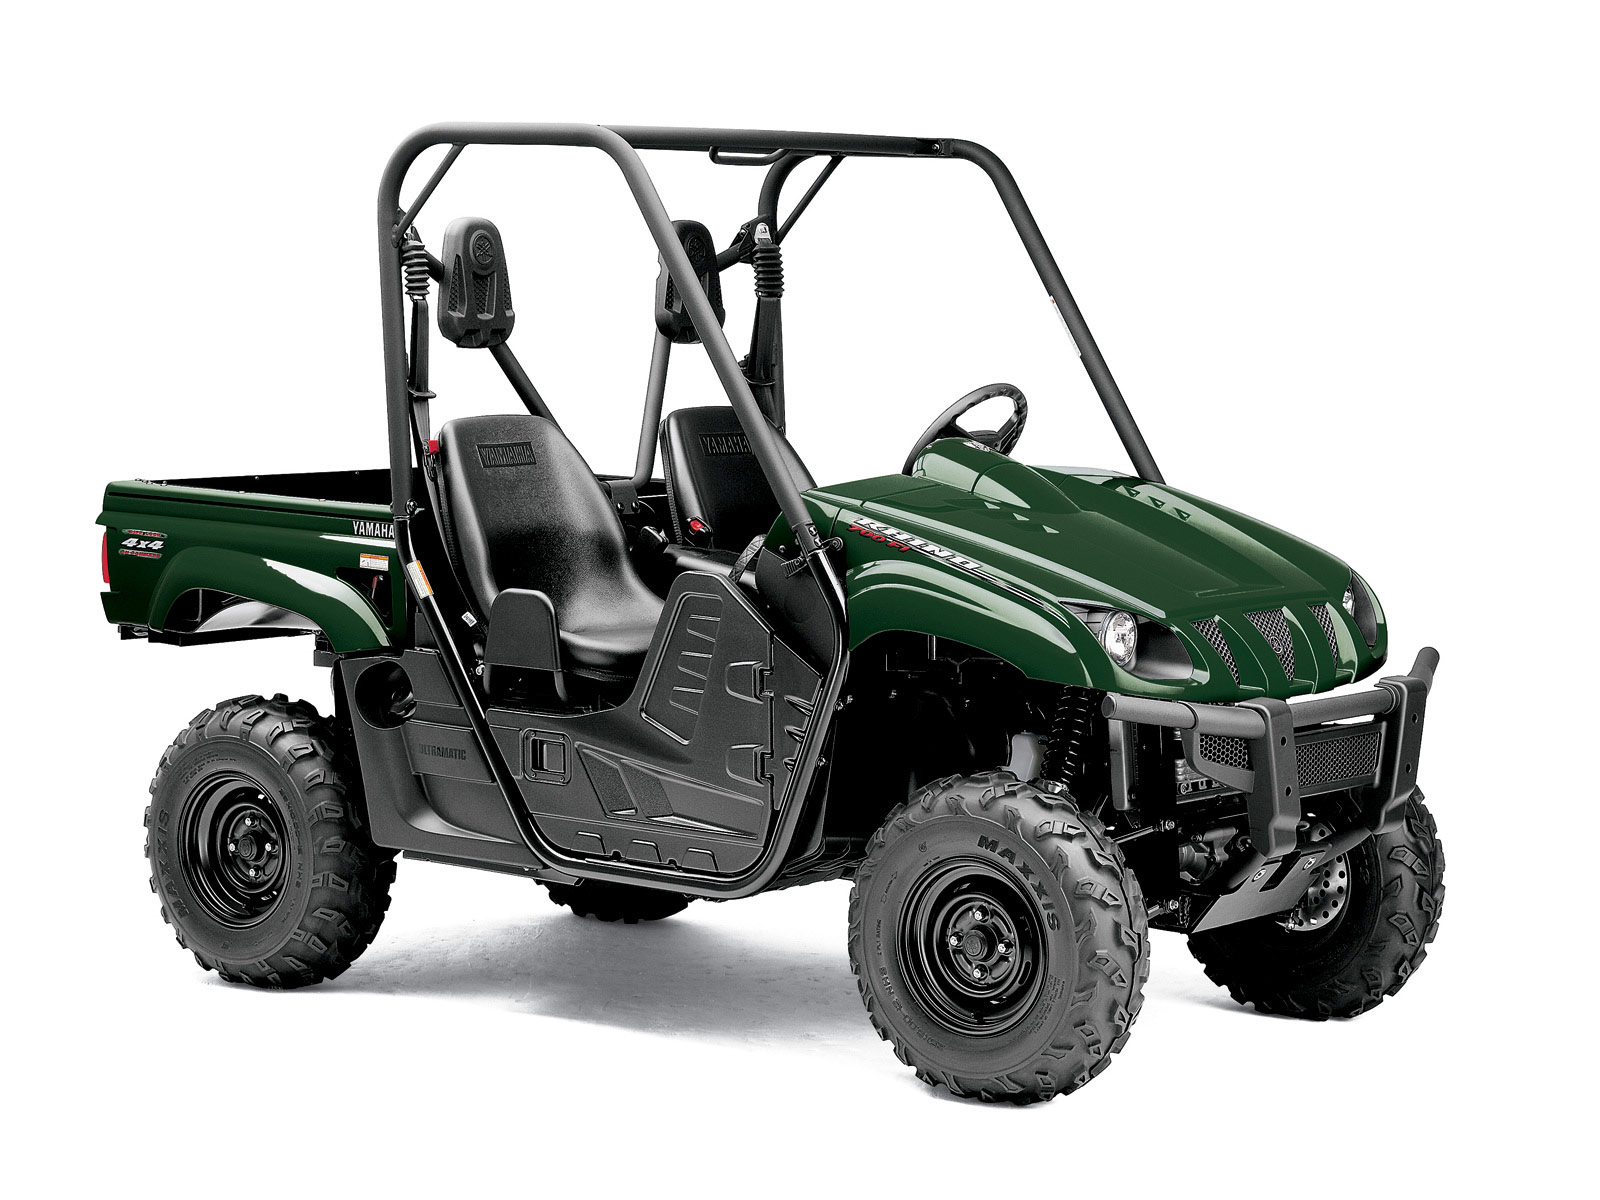 2012 yamaha rhino 700 fi auto 4x4 insurance information